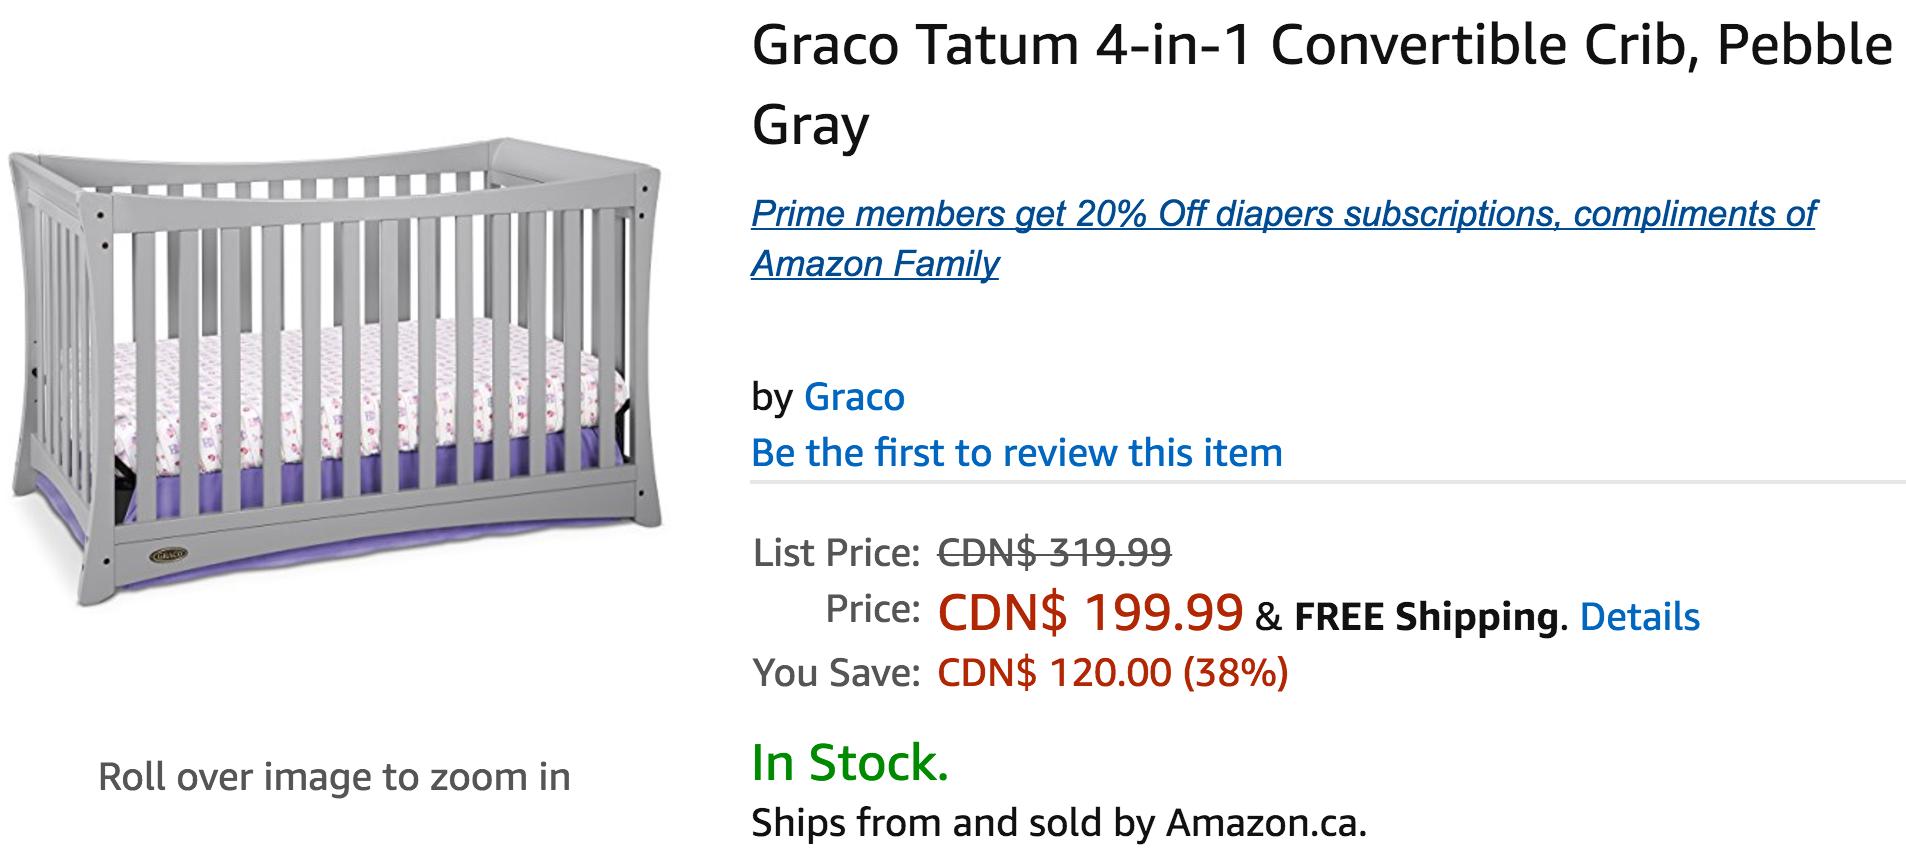 Amazon Canada Deals Save 38 On Graco Tatum 4 In 1 Convertible Crib